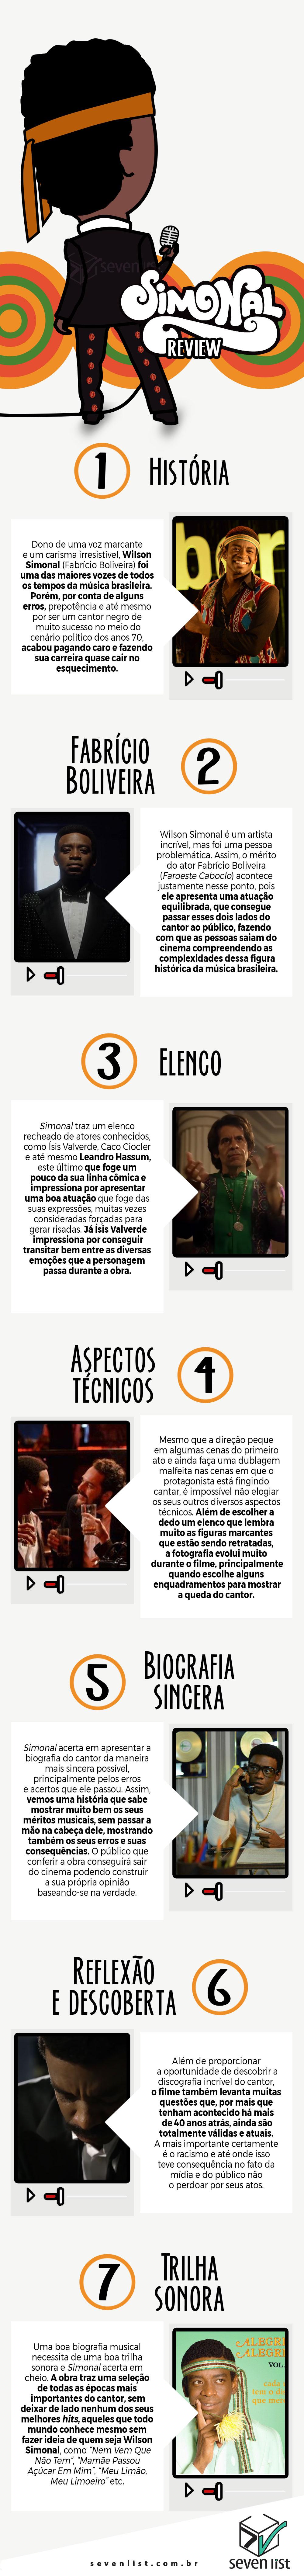 SIMONAL - FILME - CRÍTICA - SEVEN LIST